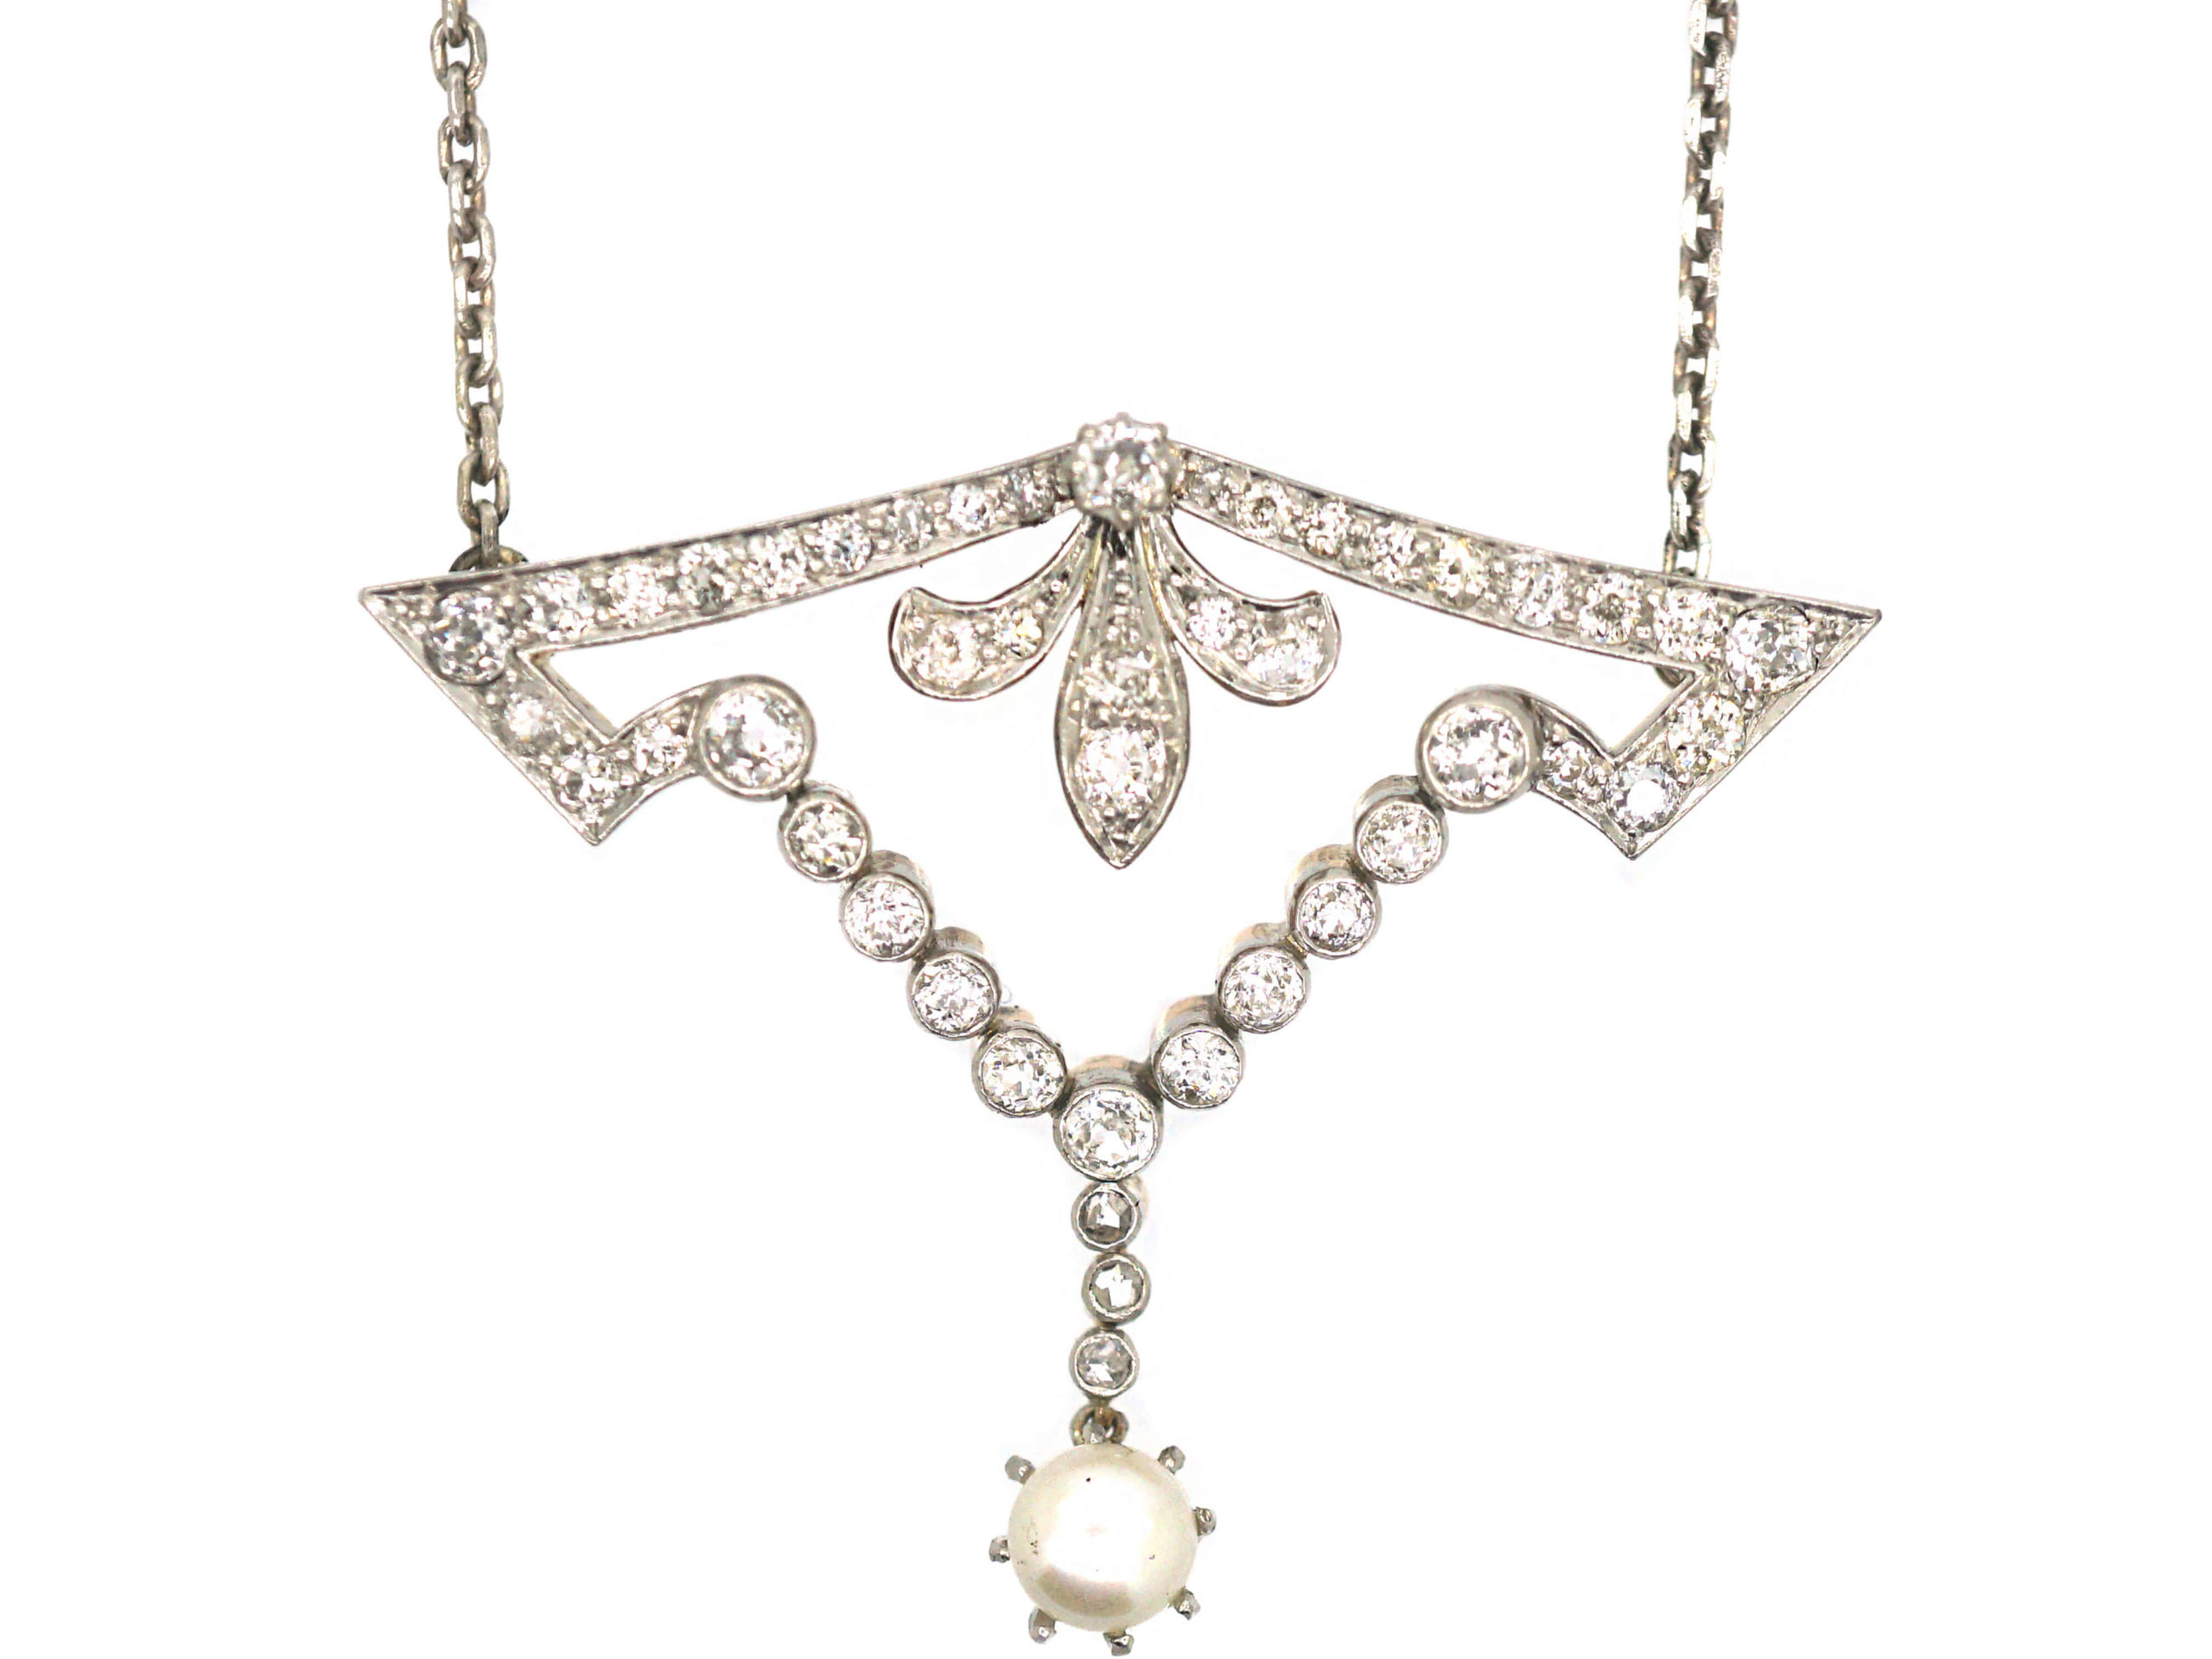 Edwardian 15ct Gold & Platinum, Diamond & Pearl Pendant on Silver Chain